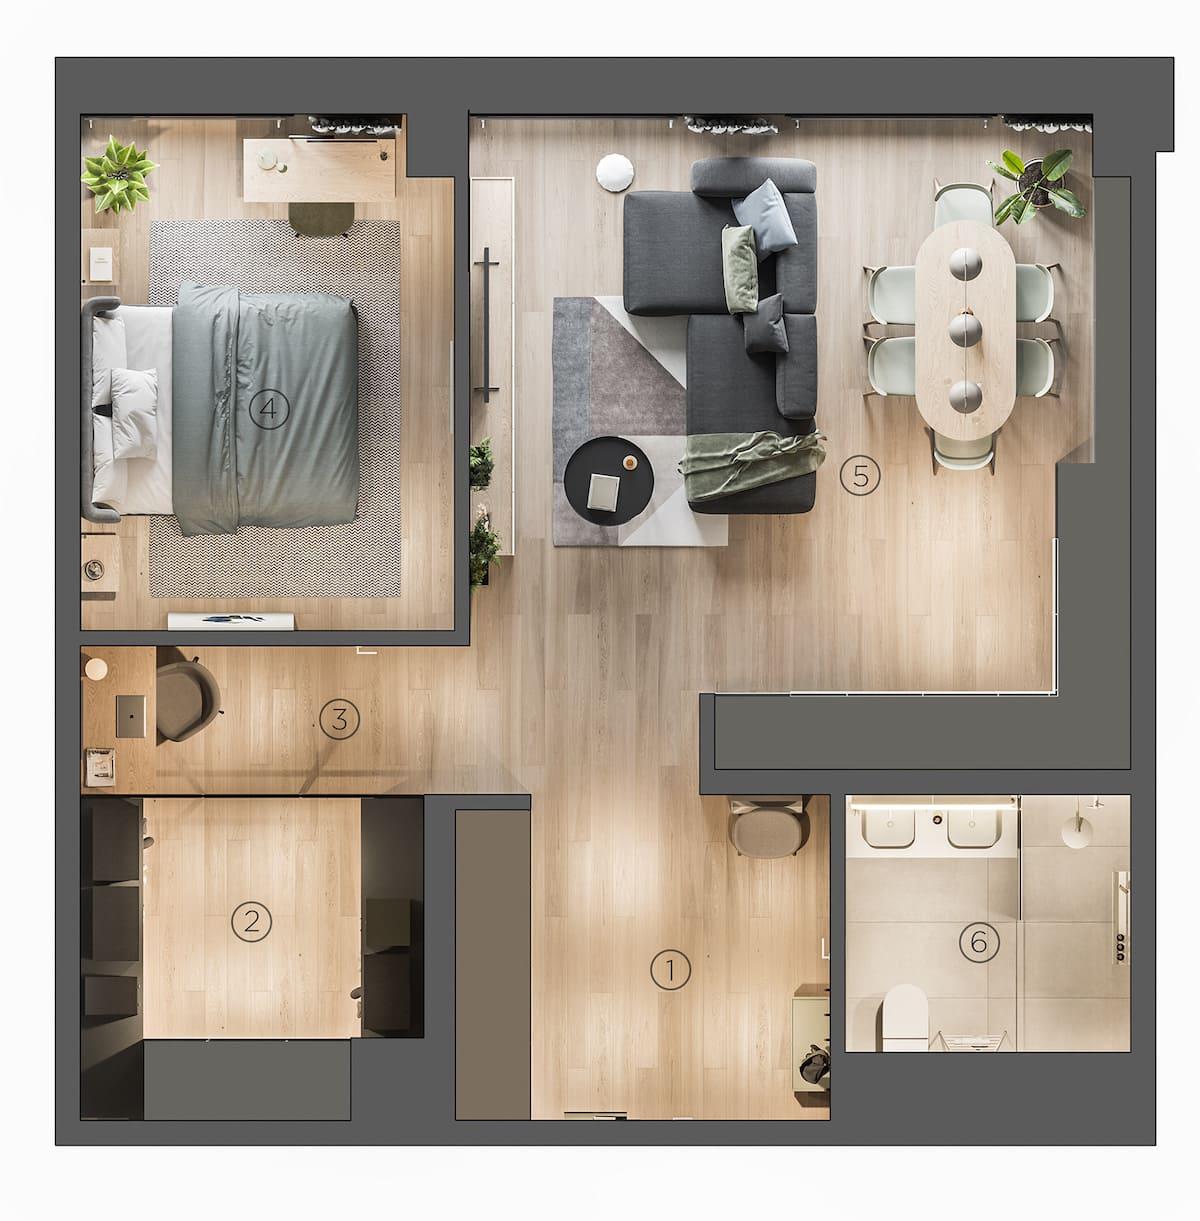 дизайн интерьера модной квартиры фото 44